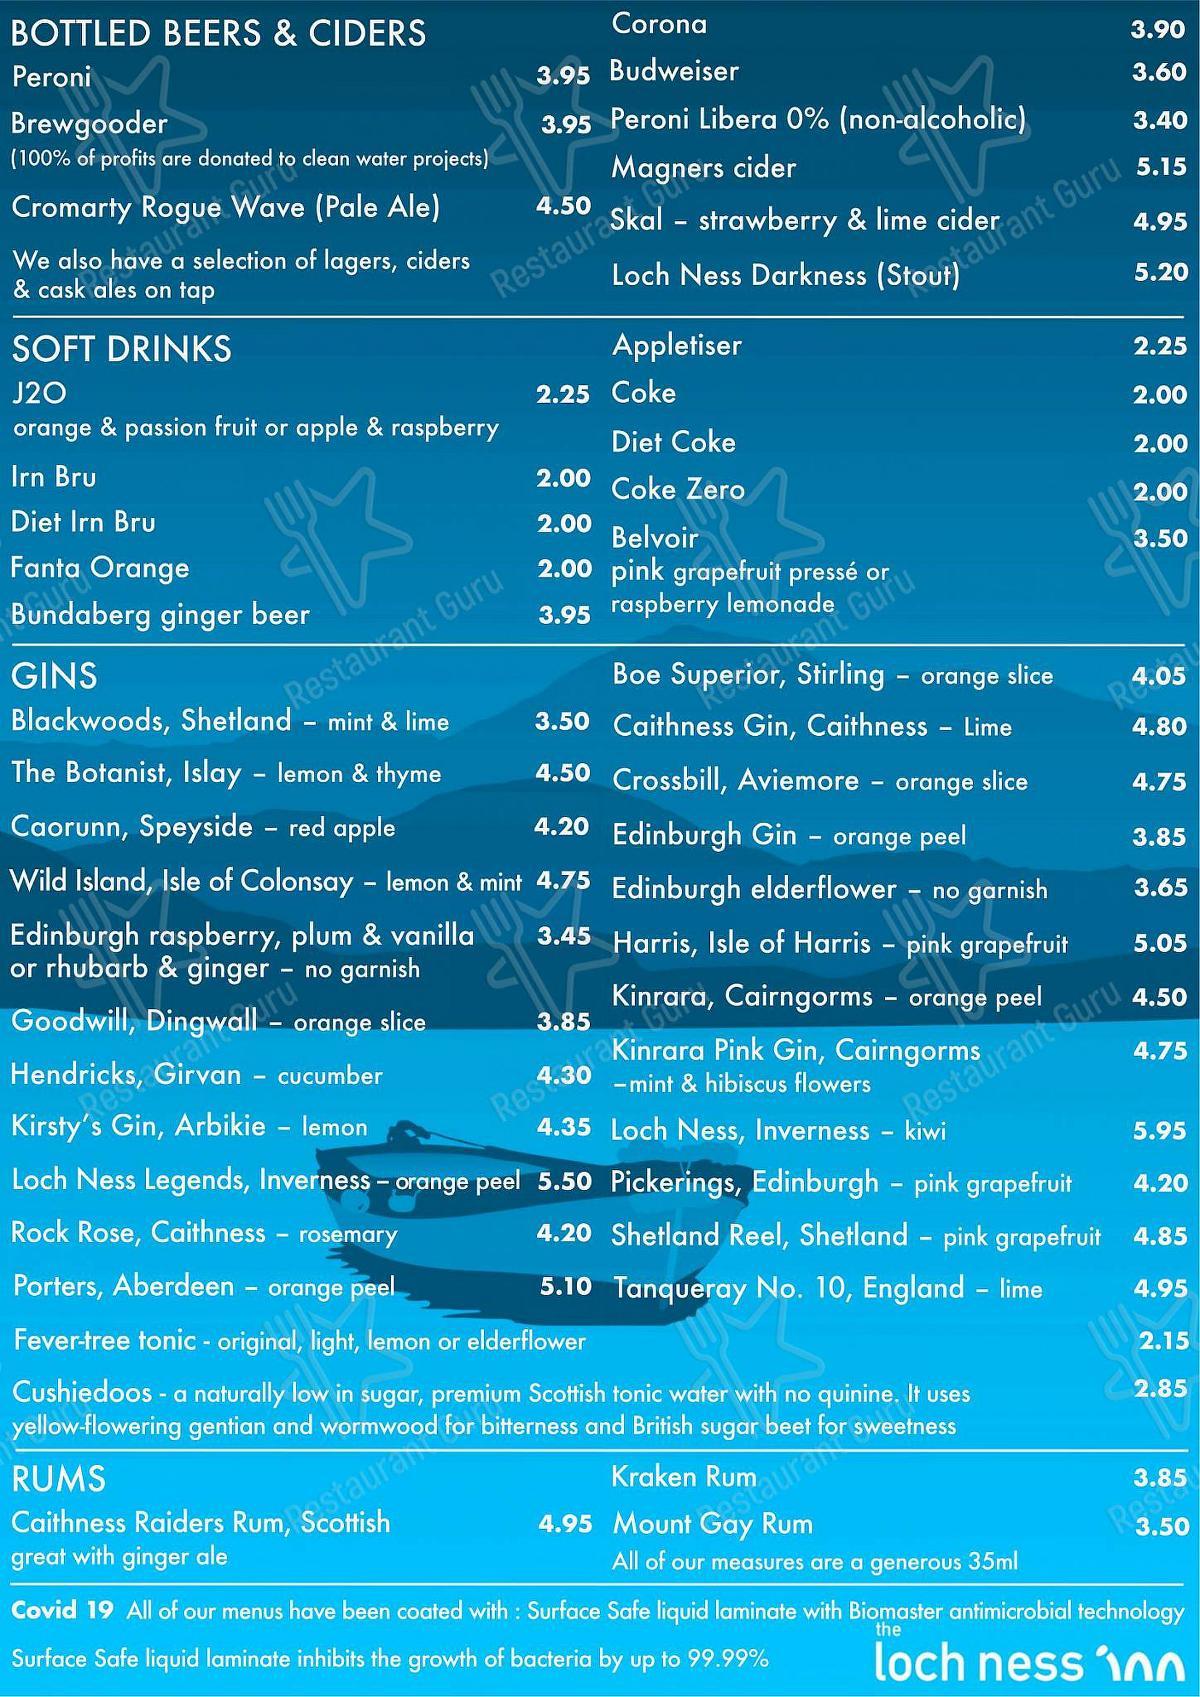 Carta de The Loch Ness Inn - comidas y bebidas